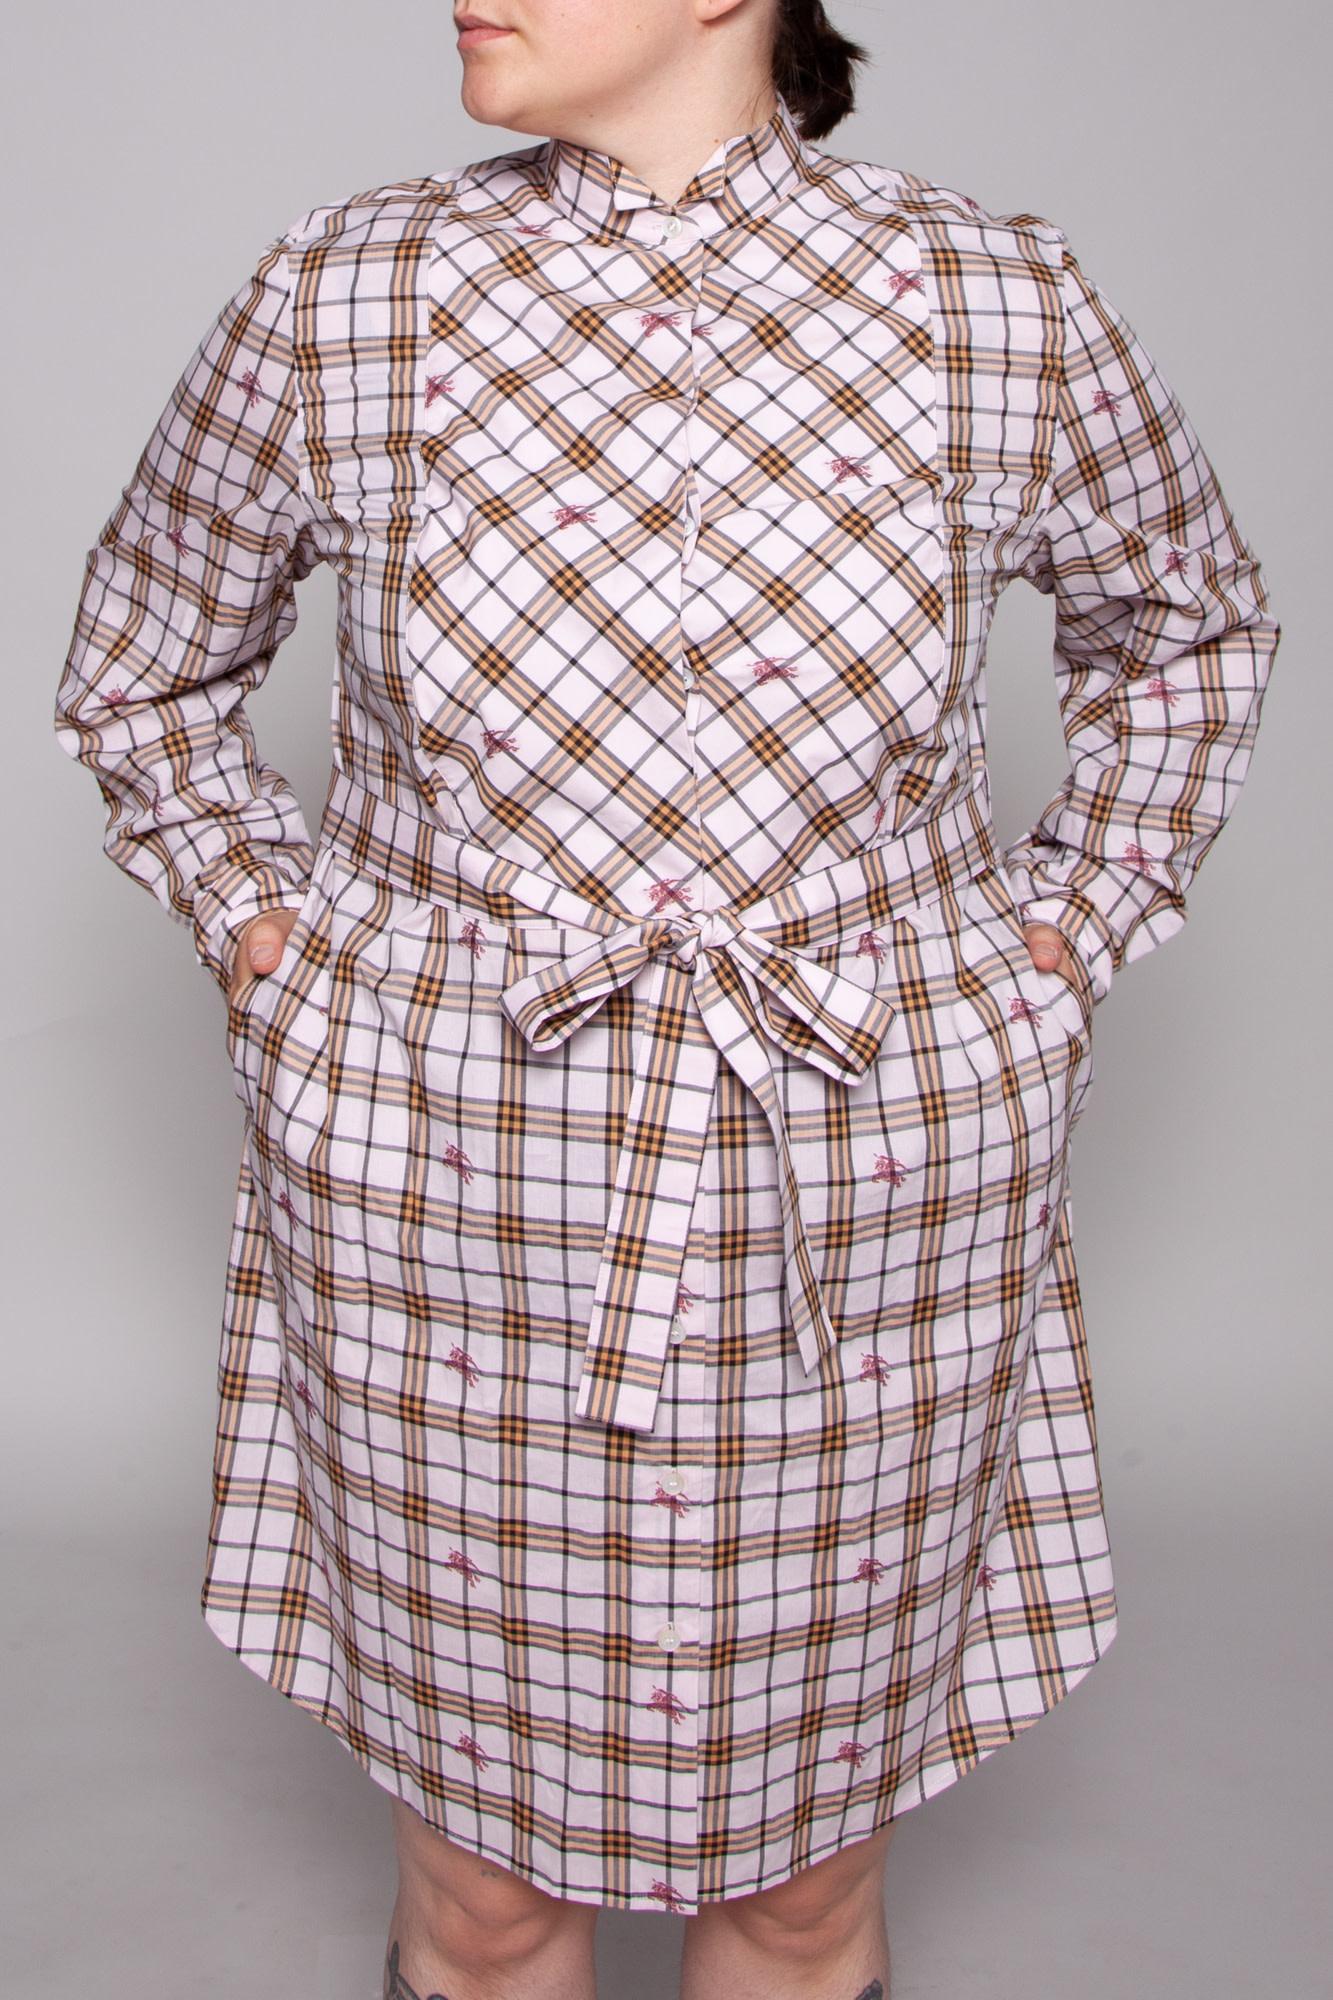 Burberry TARTAN PRINT PINK DRESS - NEW WITH TAG (SIZE 14)